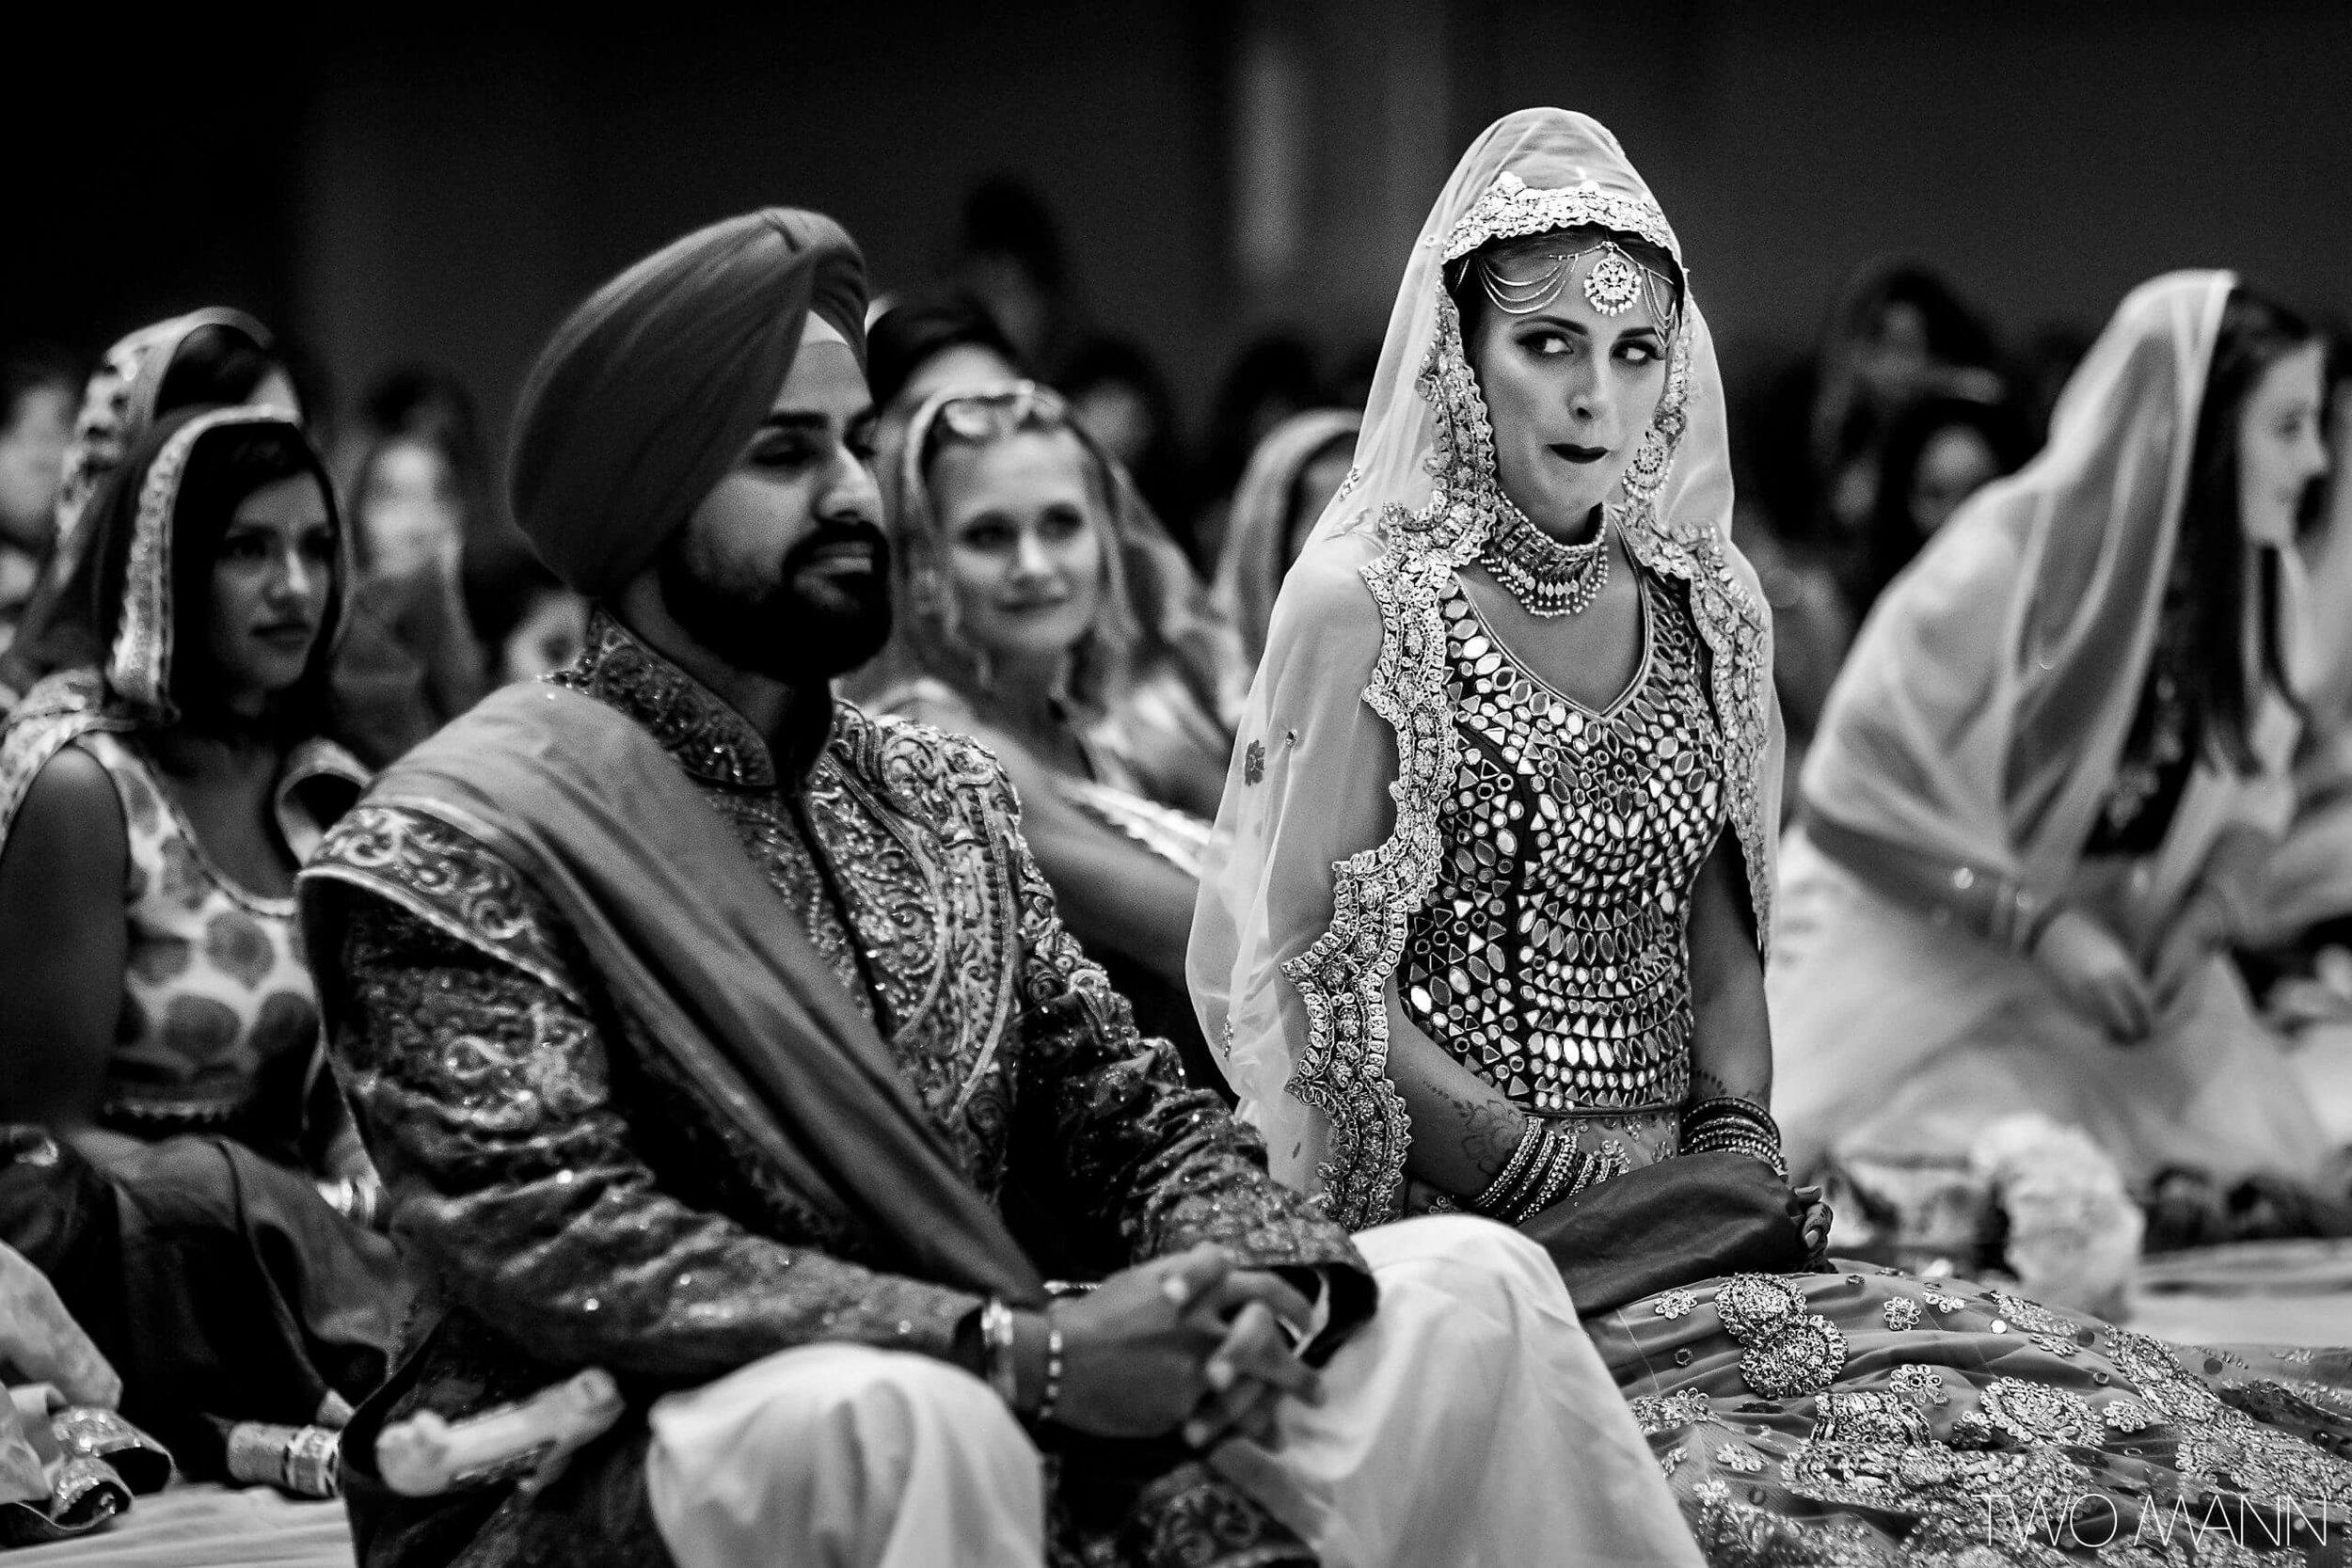 Two-Mann-Studios-Worlds-Best-Wedding-Photography-Best-of-2016-089-2560x1707.jpg